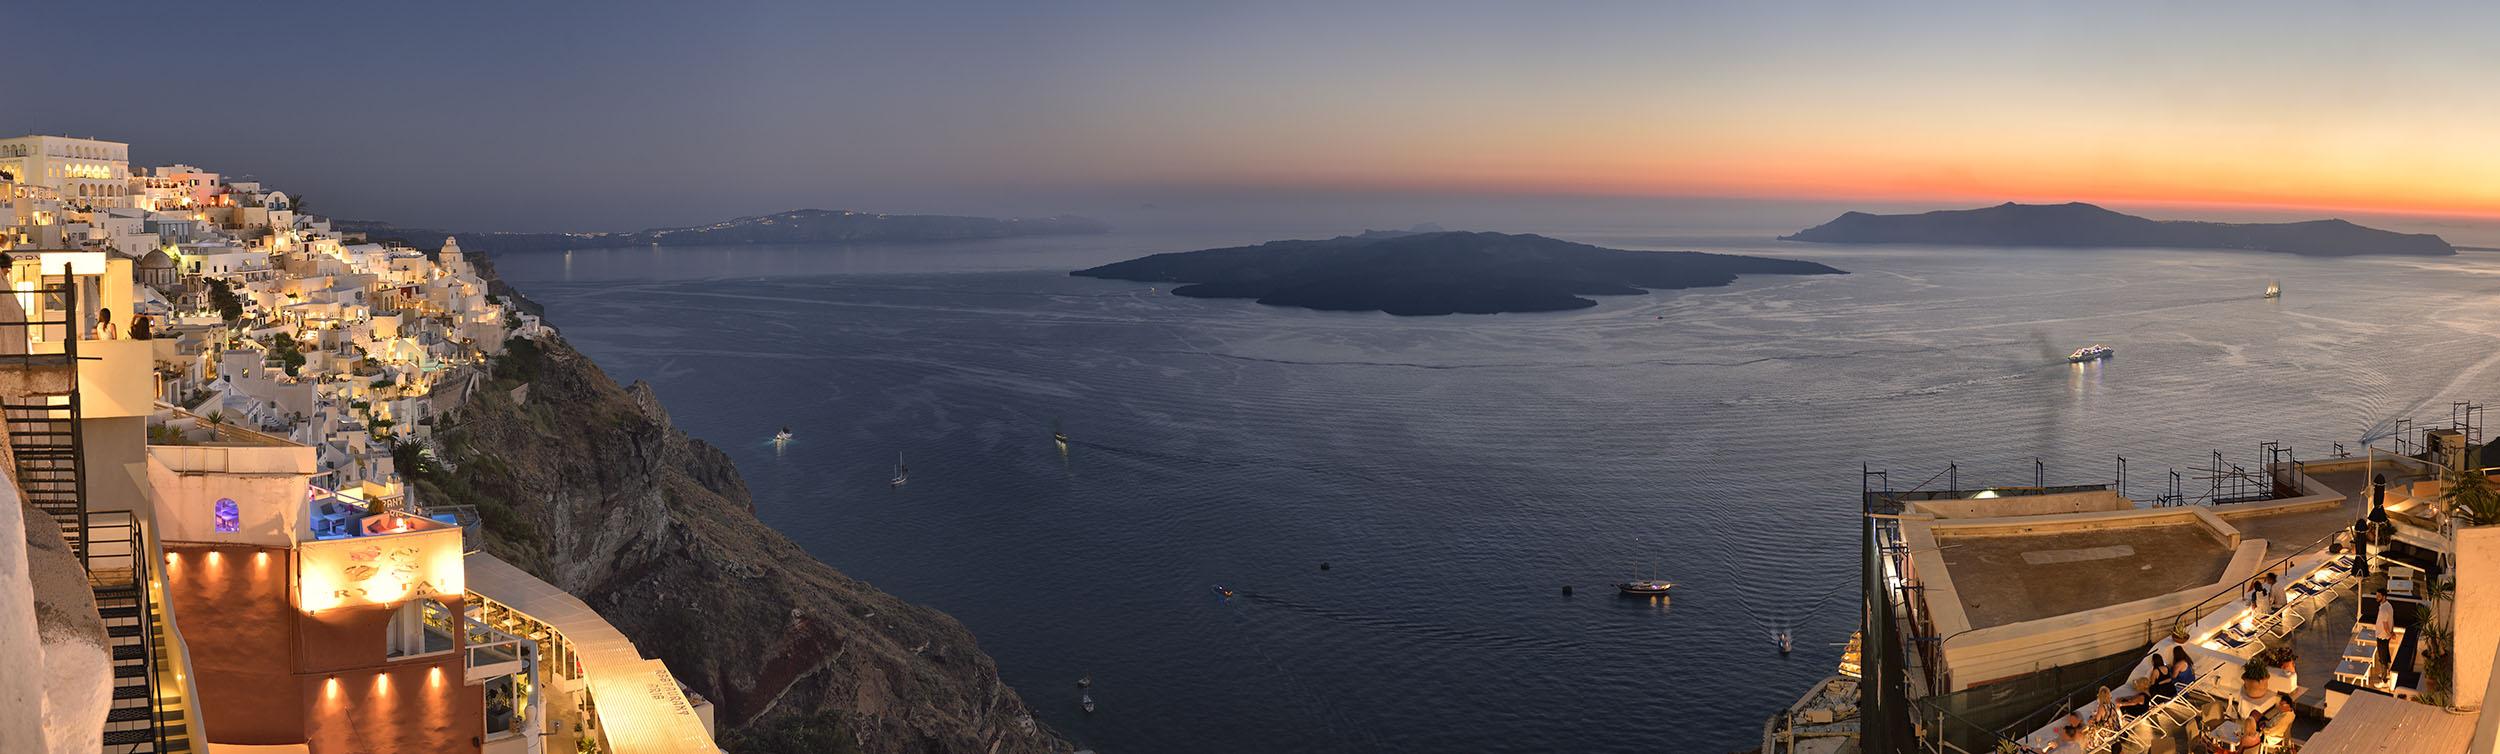 Night overlooking Santorini Caldera